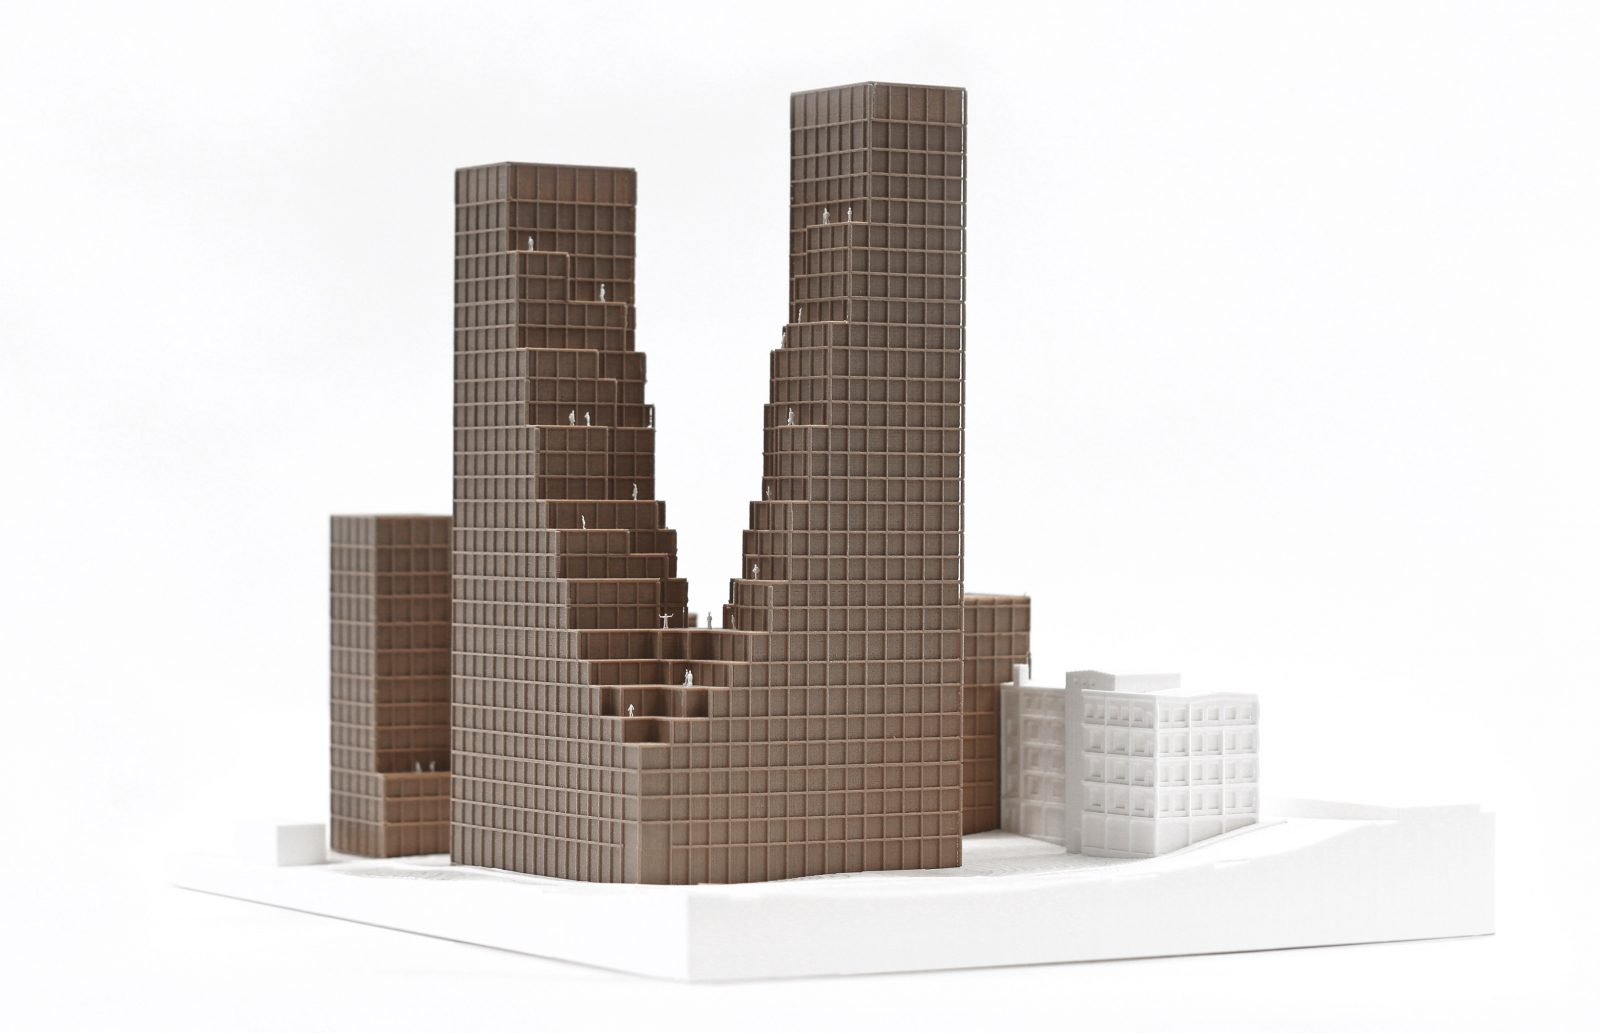 KjellanderSjoberg Nacka-Port modell perspektiv 3600x2324px